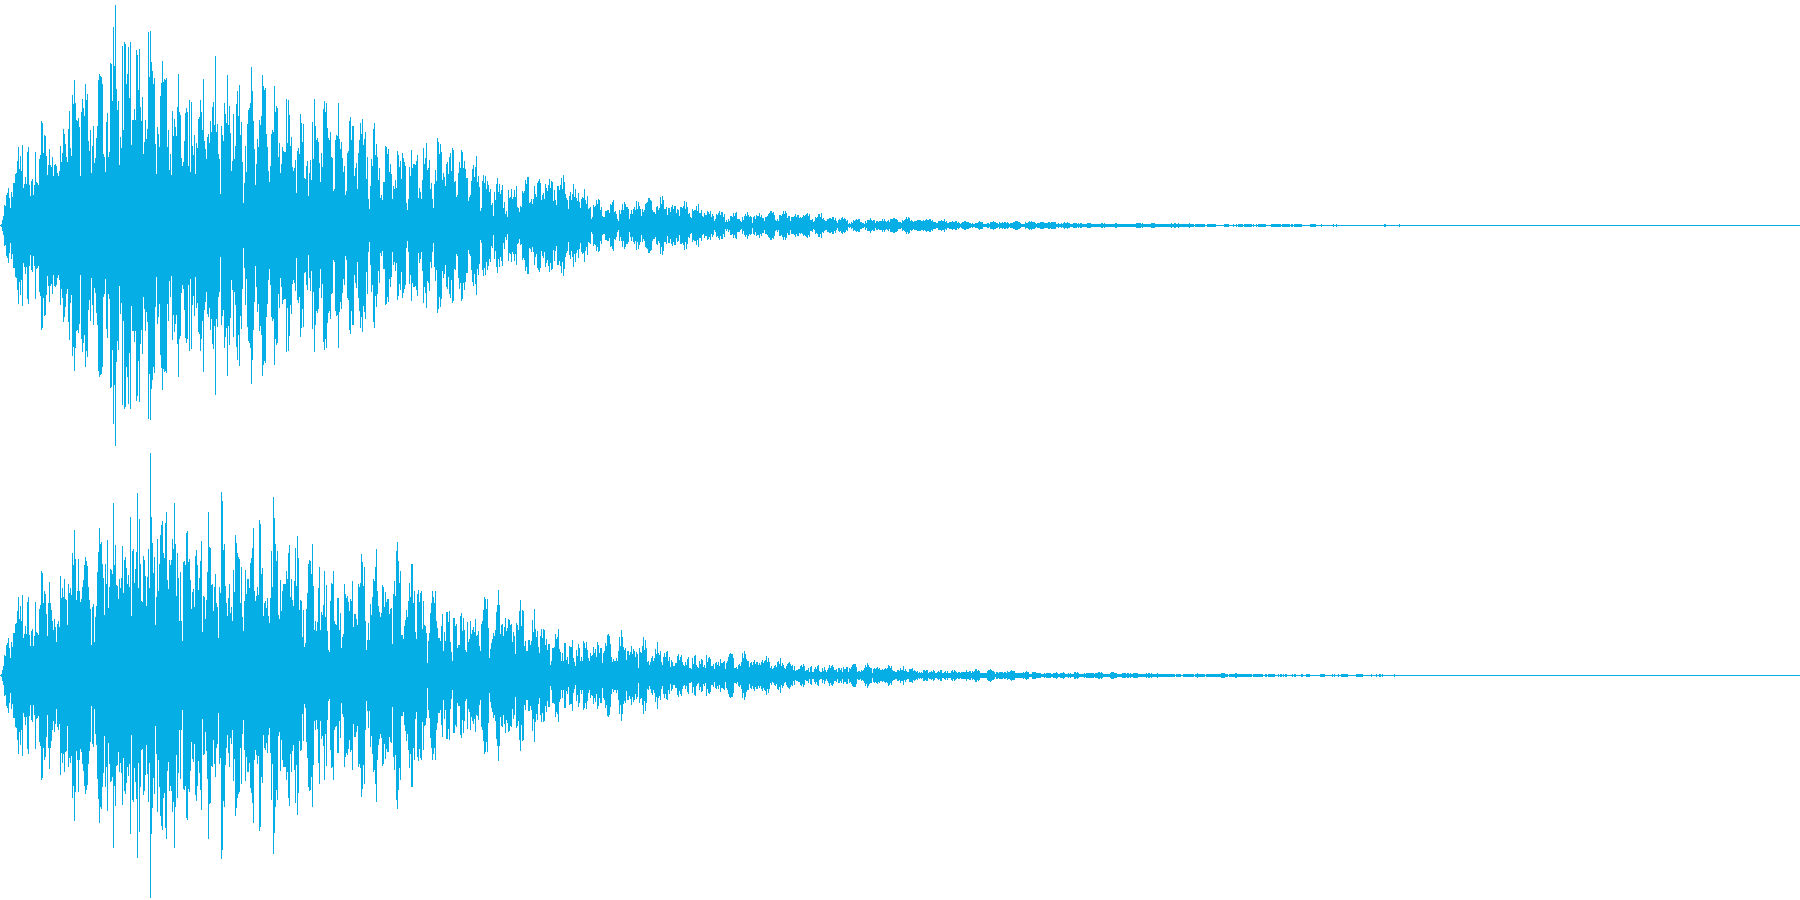 SE 不穏な空気 疑い 異変 目撃の再生済みの波形